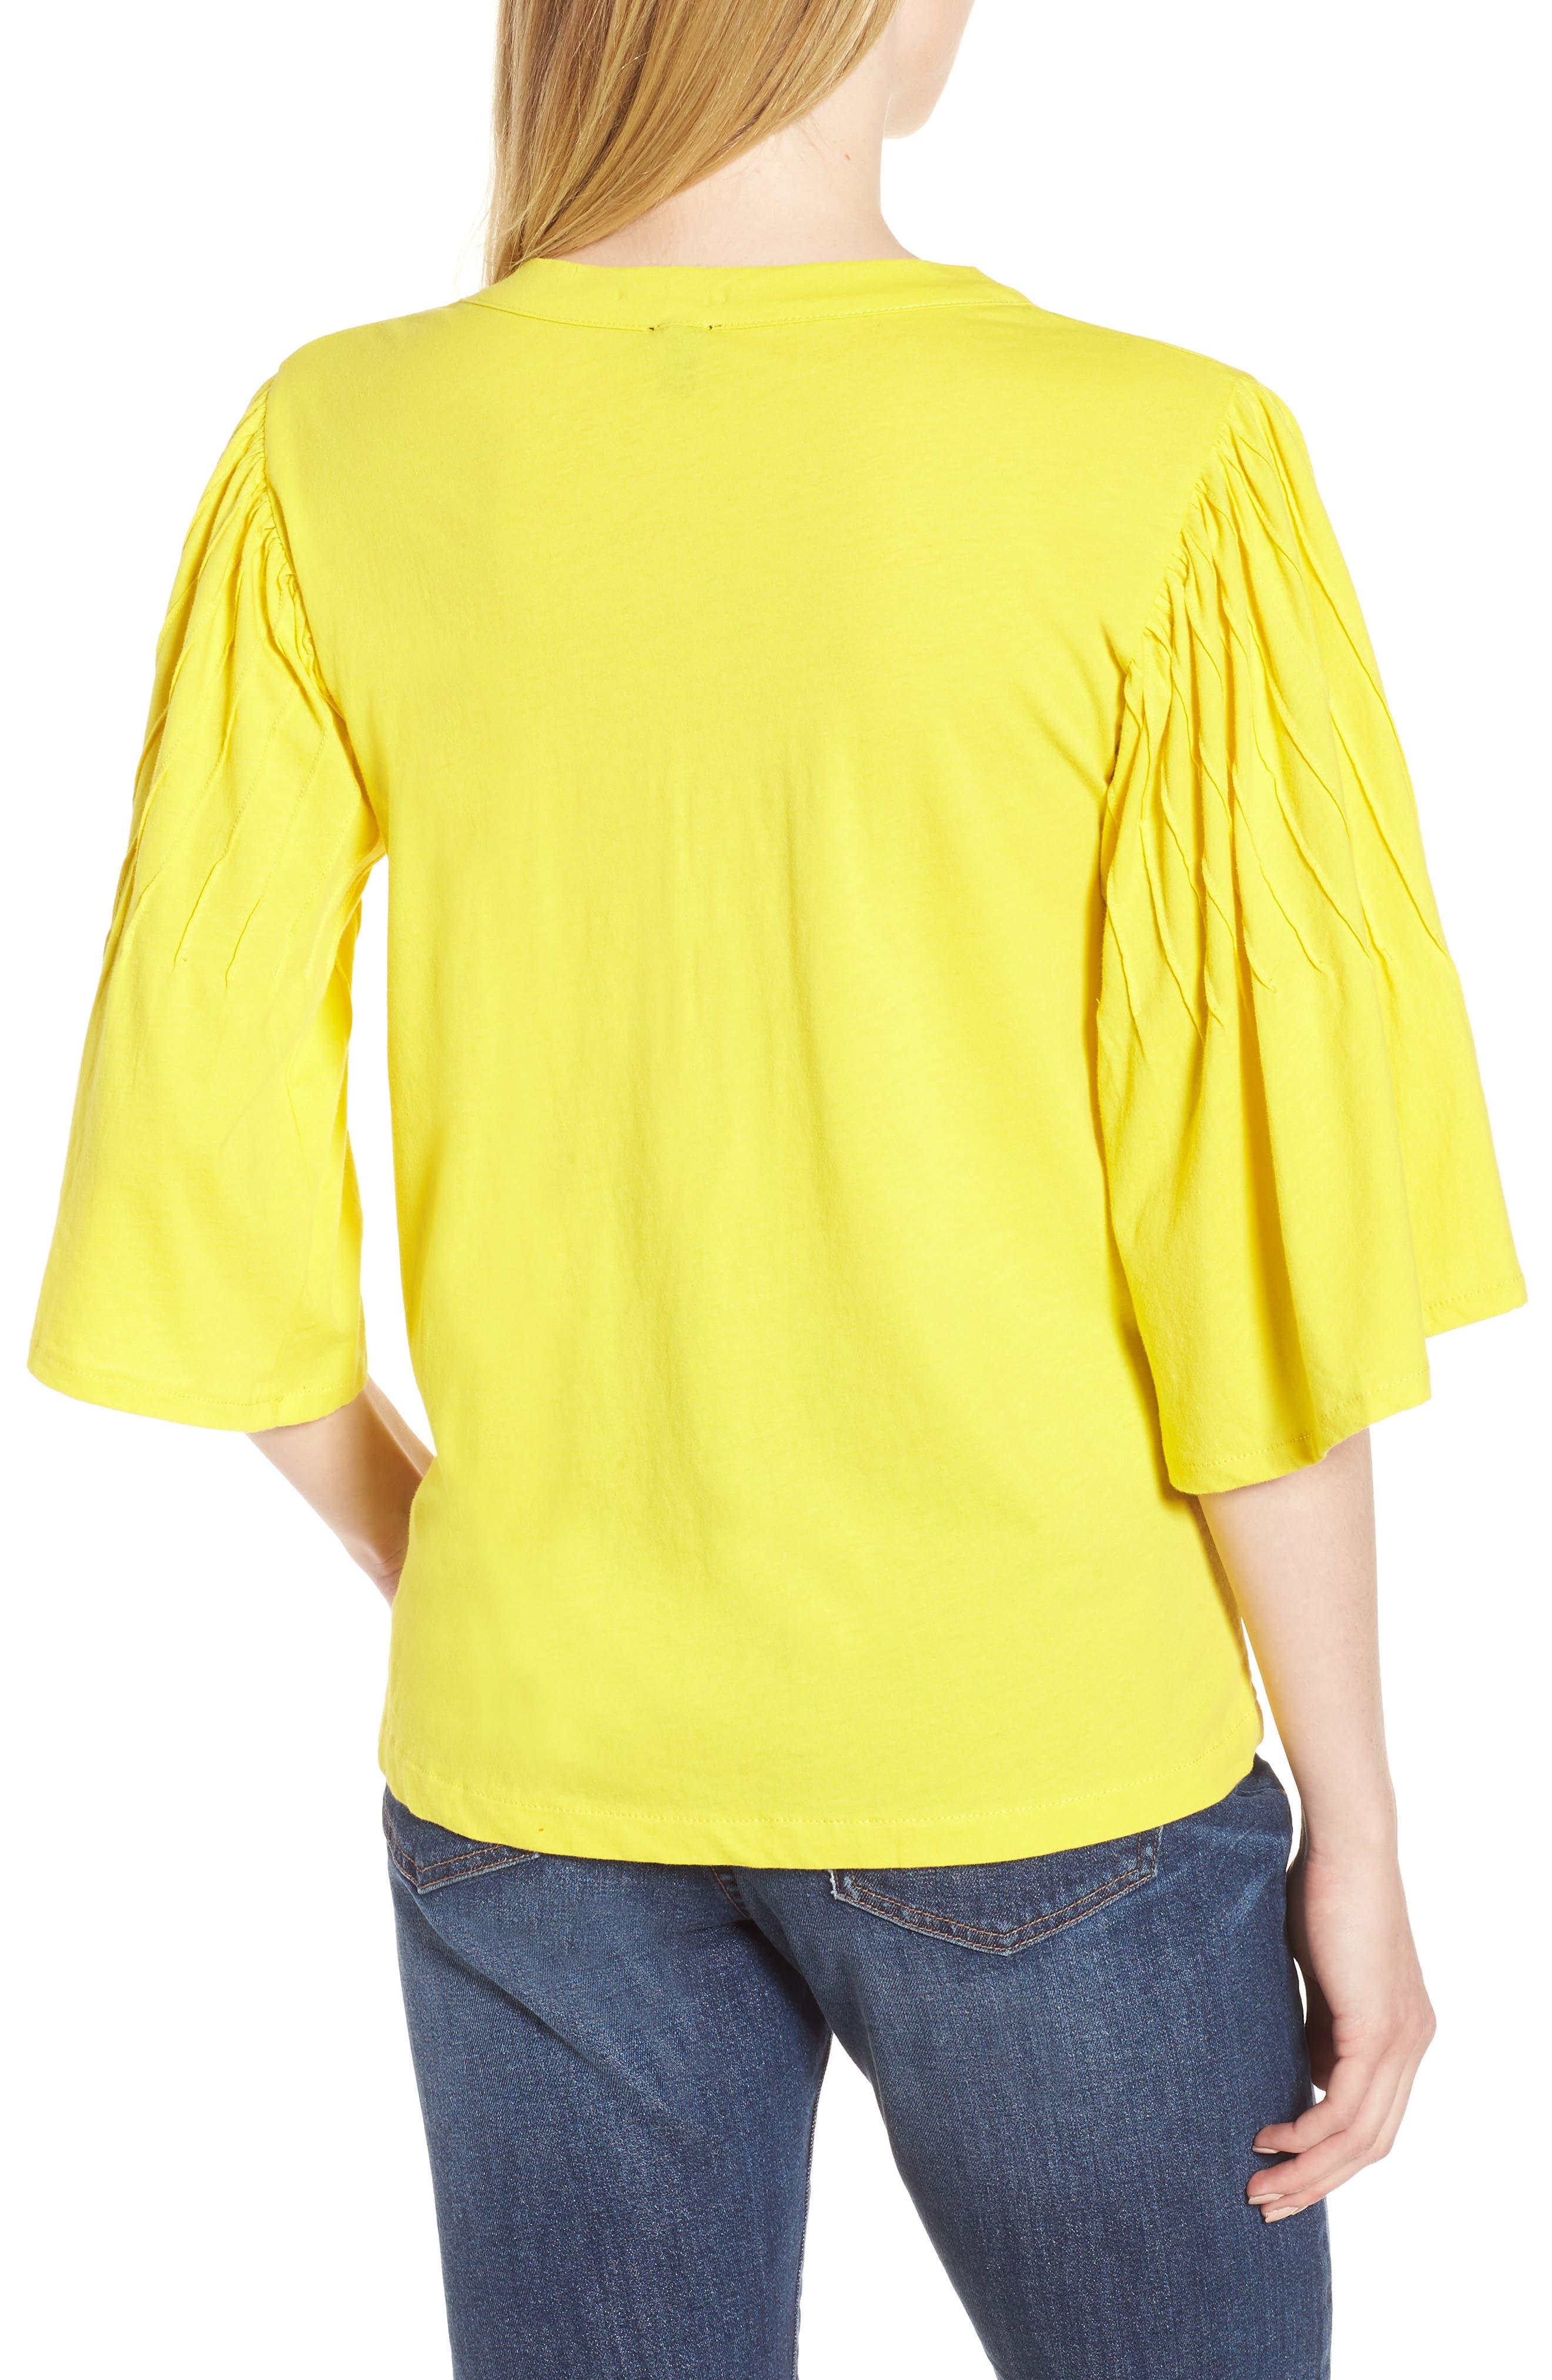 Pintuck Sleeve Cotton Blouse,                             Alternate thumbnail 2, color,                             Vivid Canary